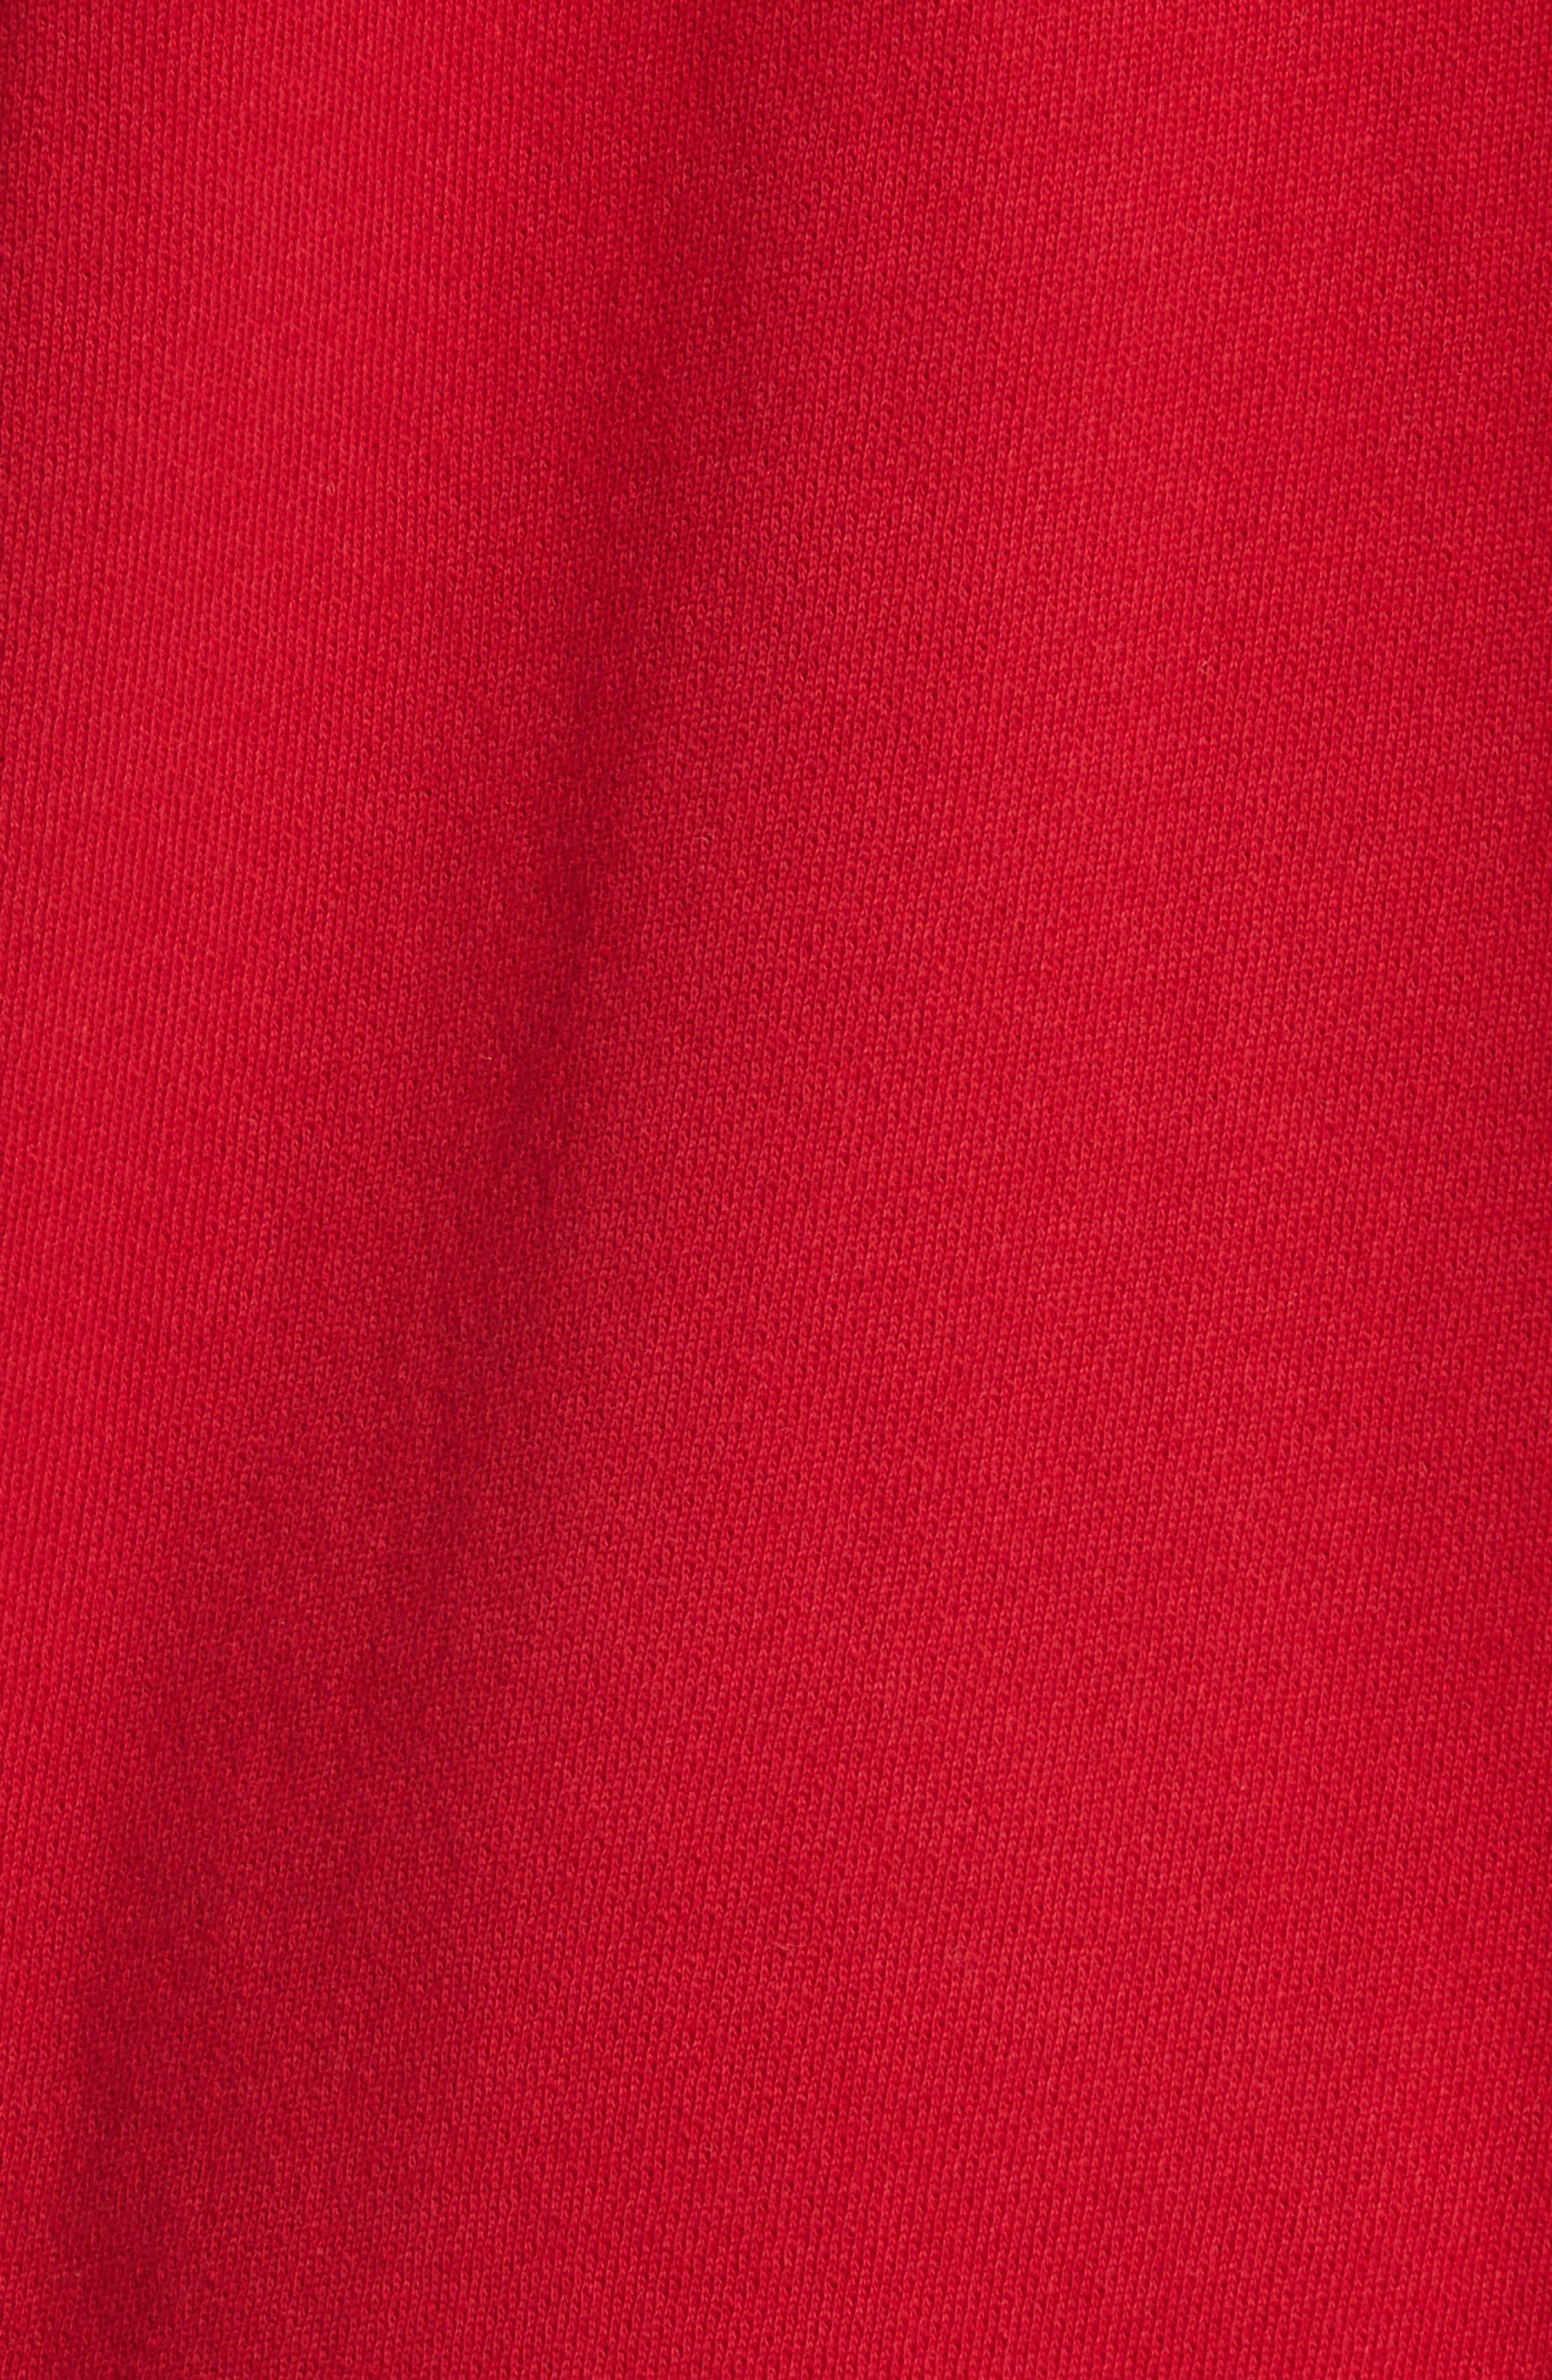 Adene Hooded Sweatshirt,                             Alternate thumbnail 5, color,                             600